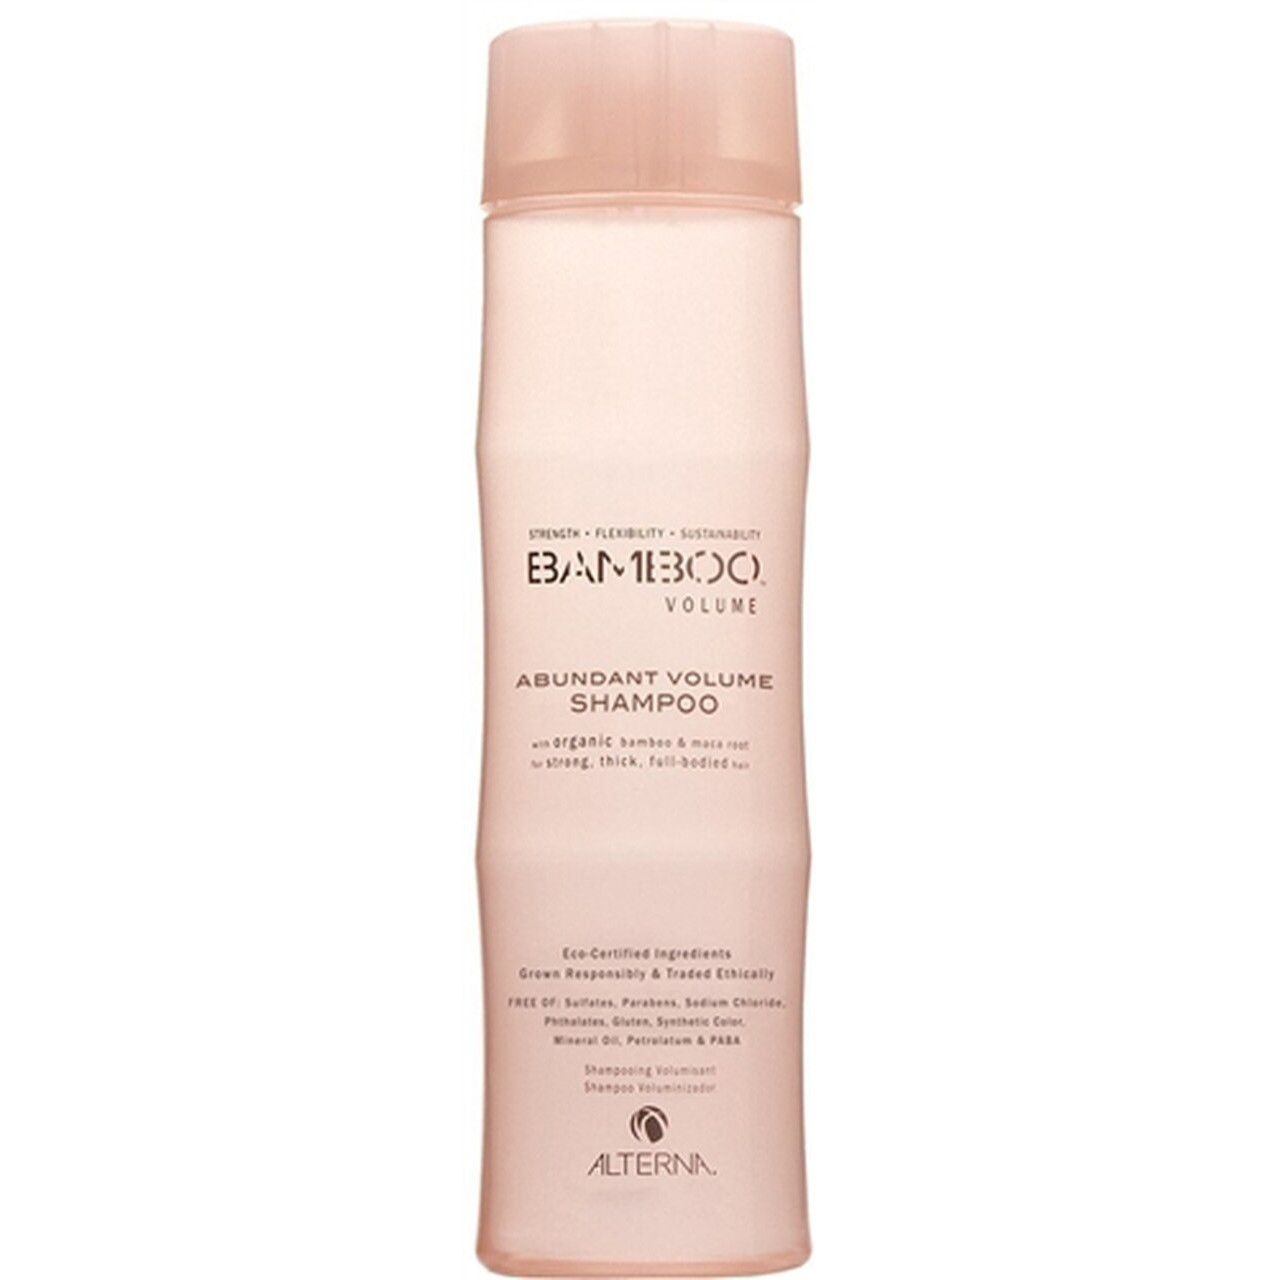 Alterna Bamboo Abundant Volume Shampoo - 8.5 OZ